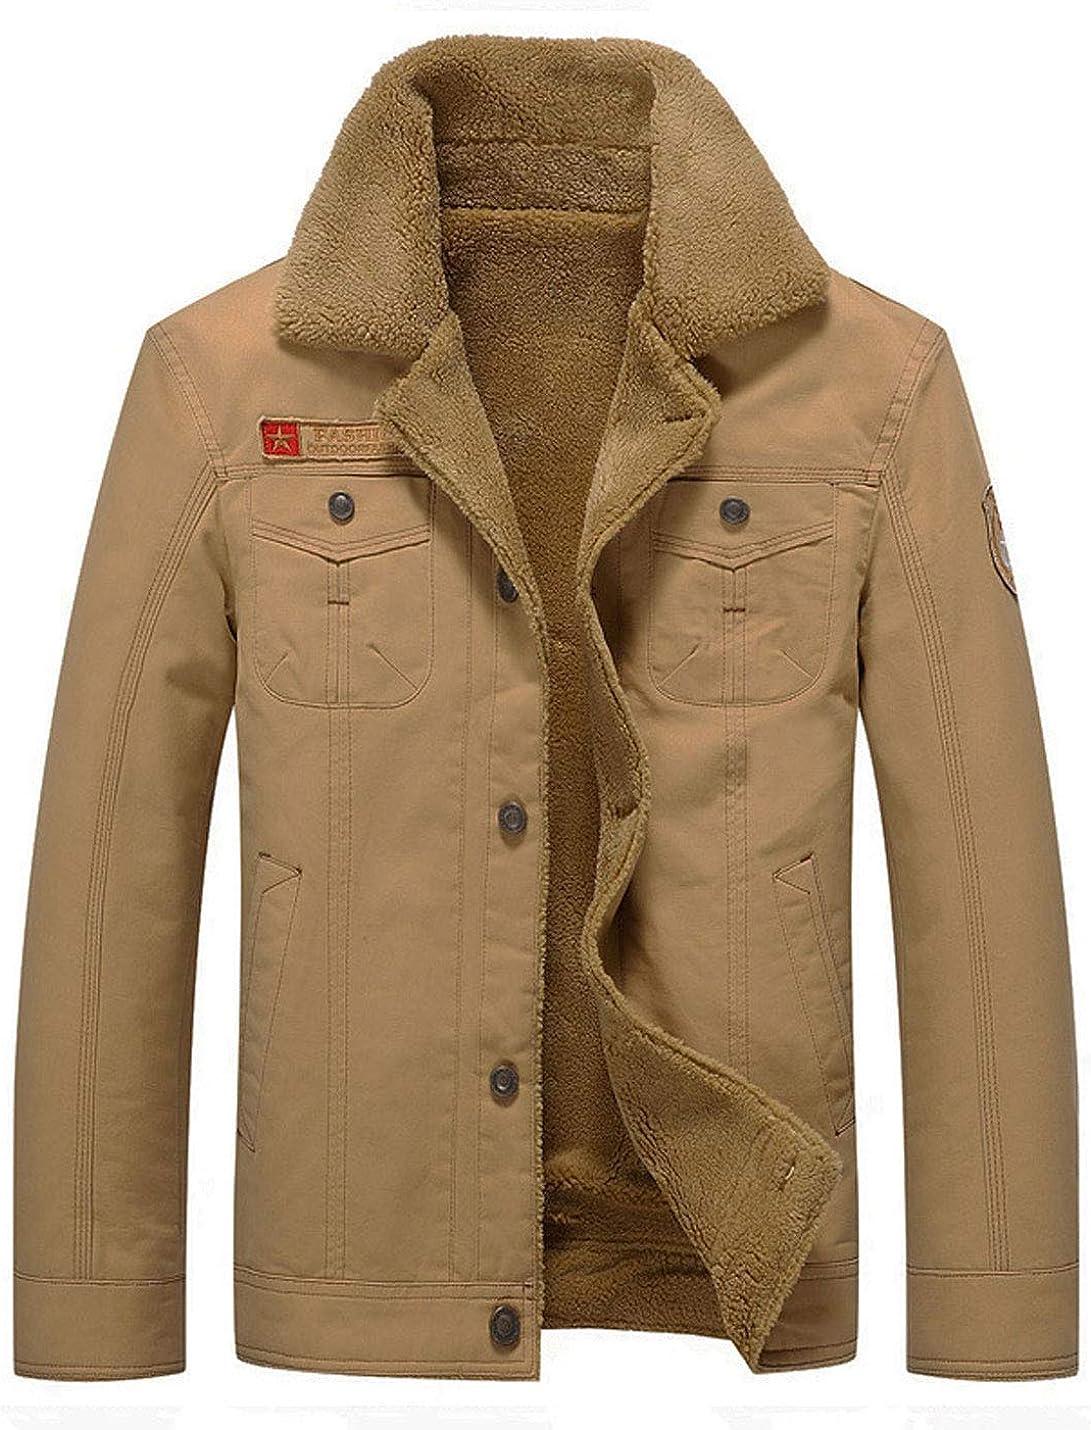 Omoone Men's Button Up Lapel Fleece Lined Winter Military Parka Bomber Jacket